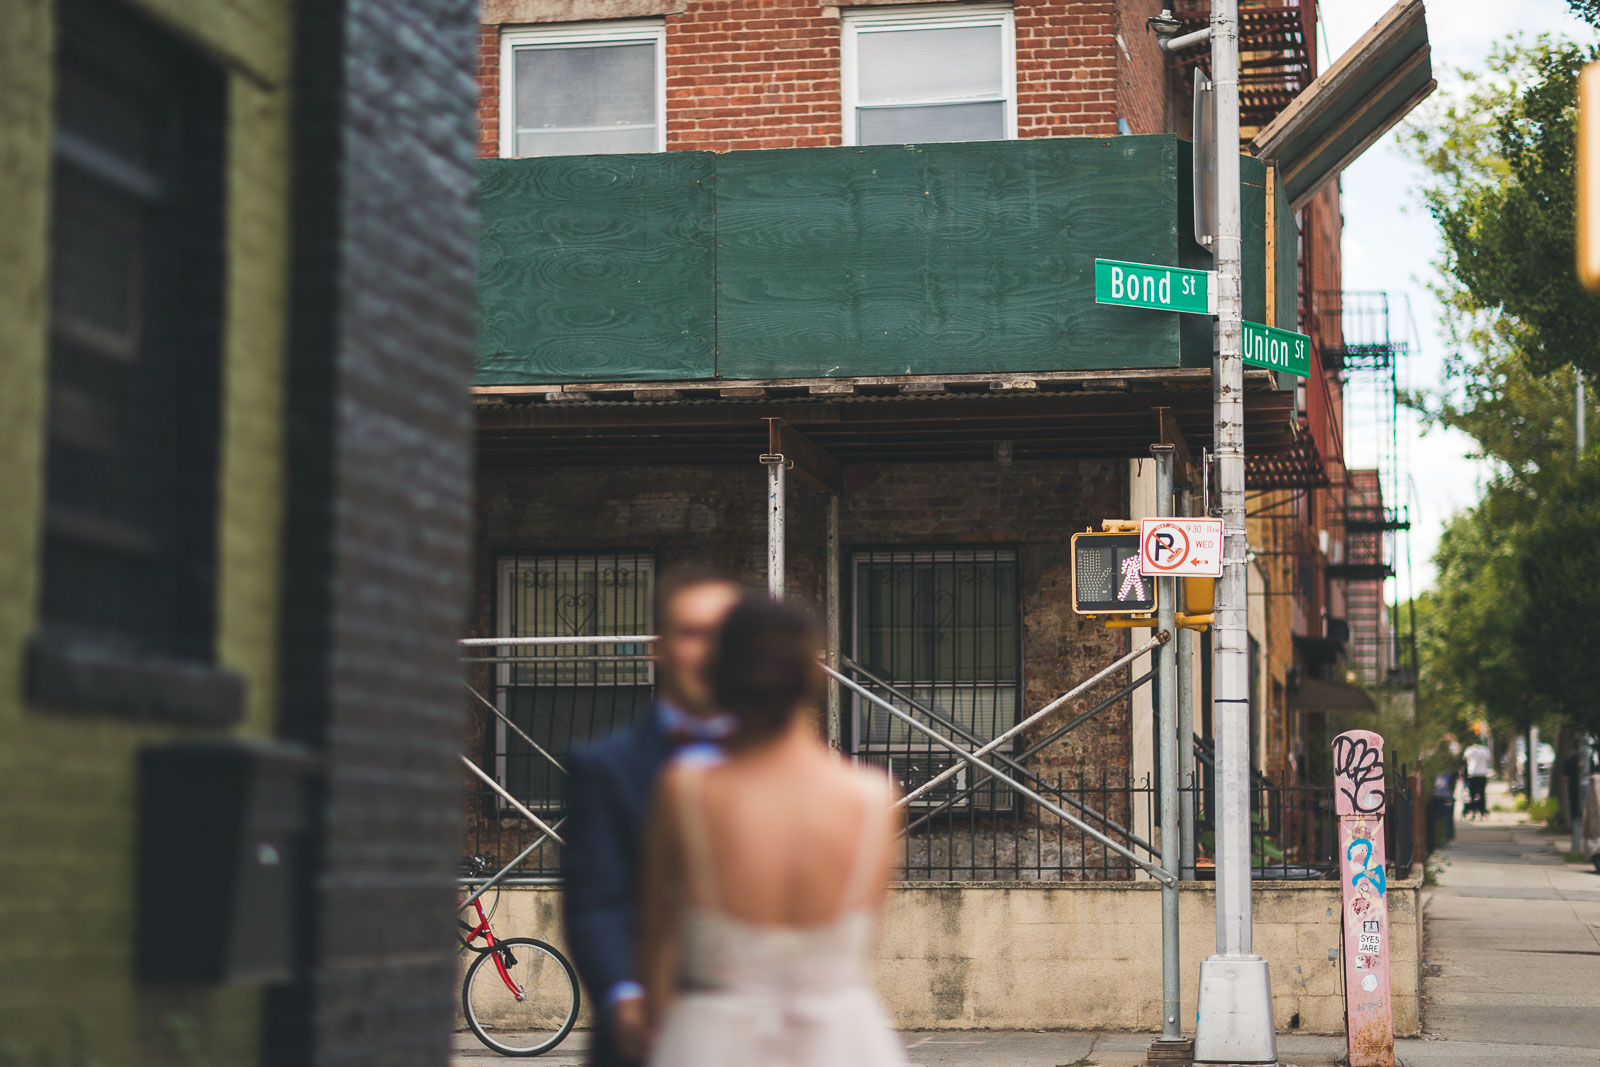 Bond and Union St Brooklyn